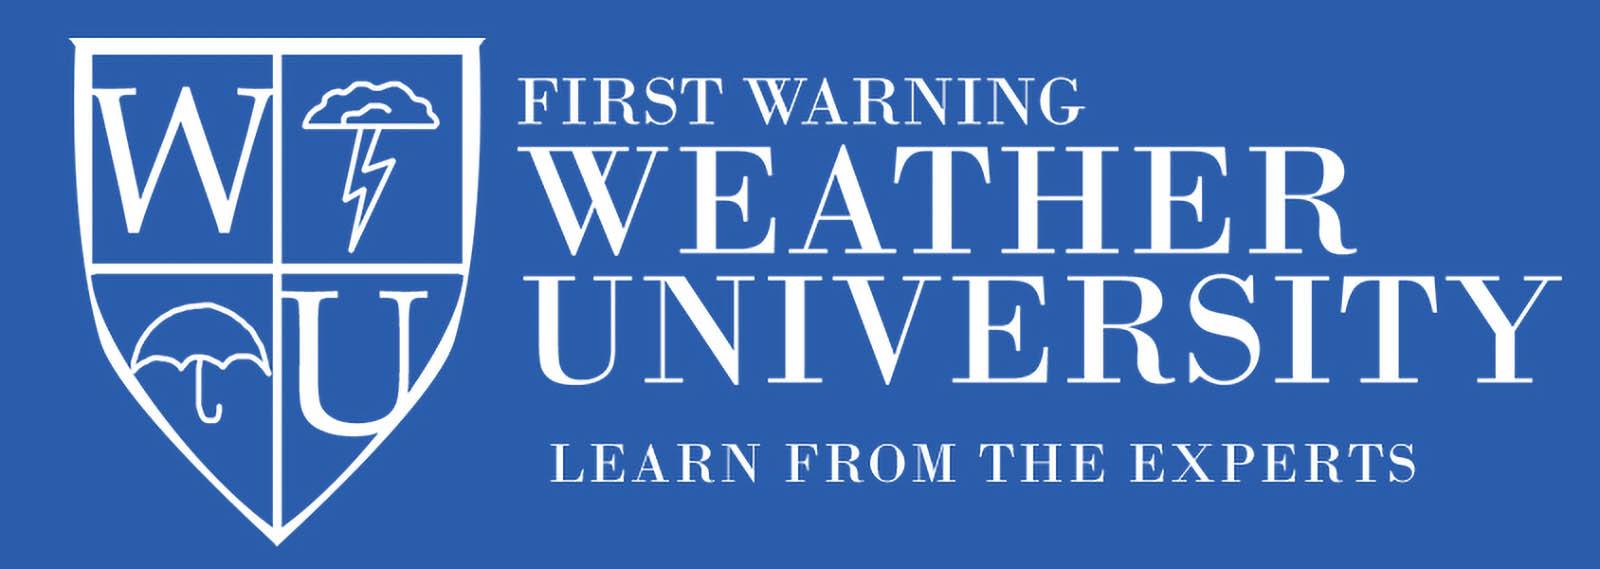 First Warning Weather Team Logo